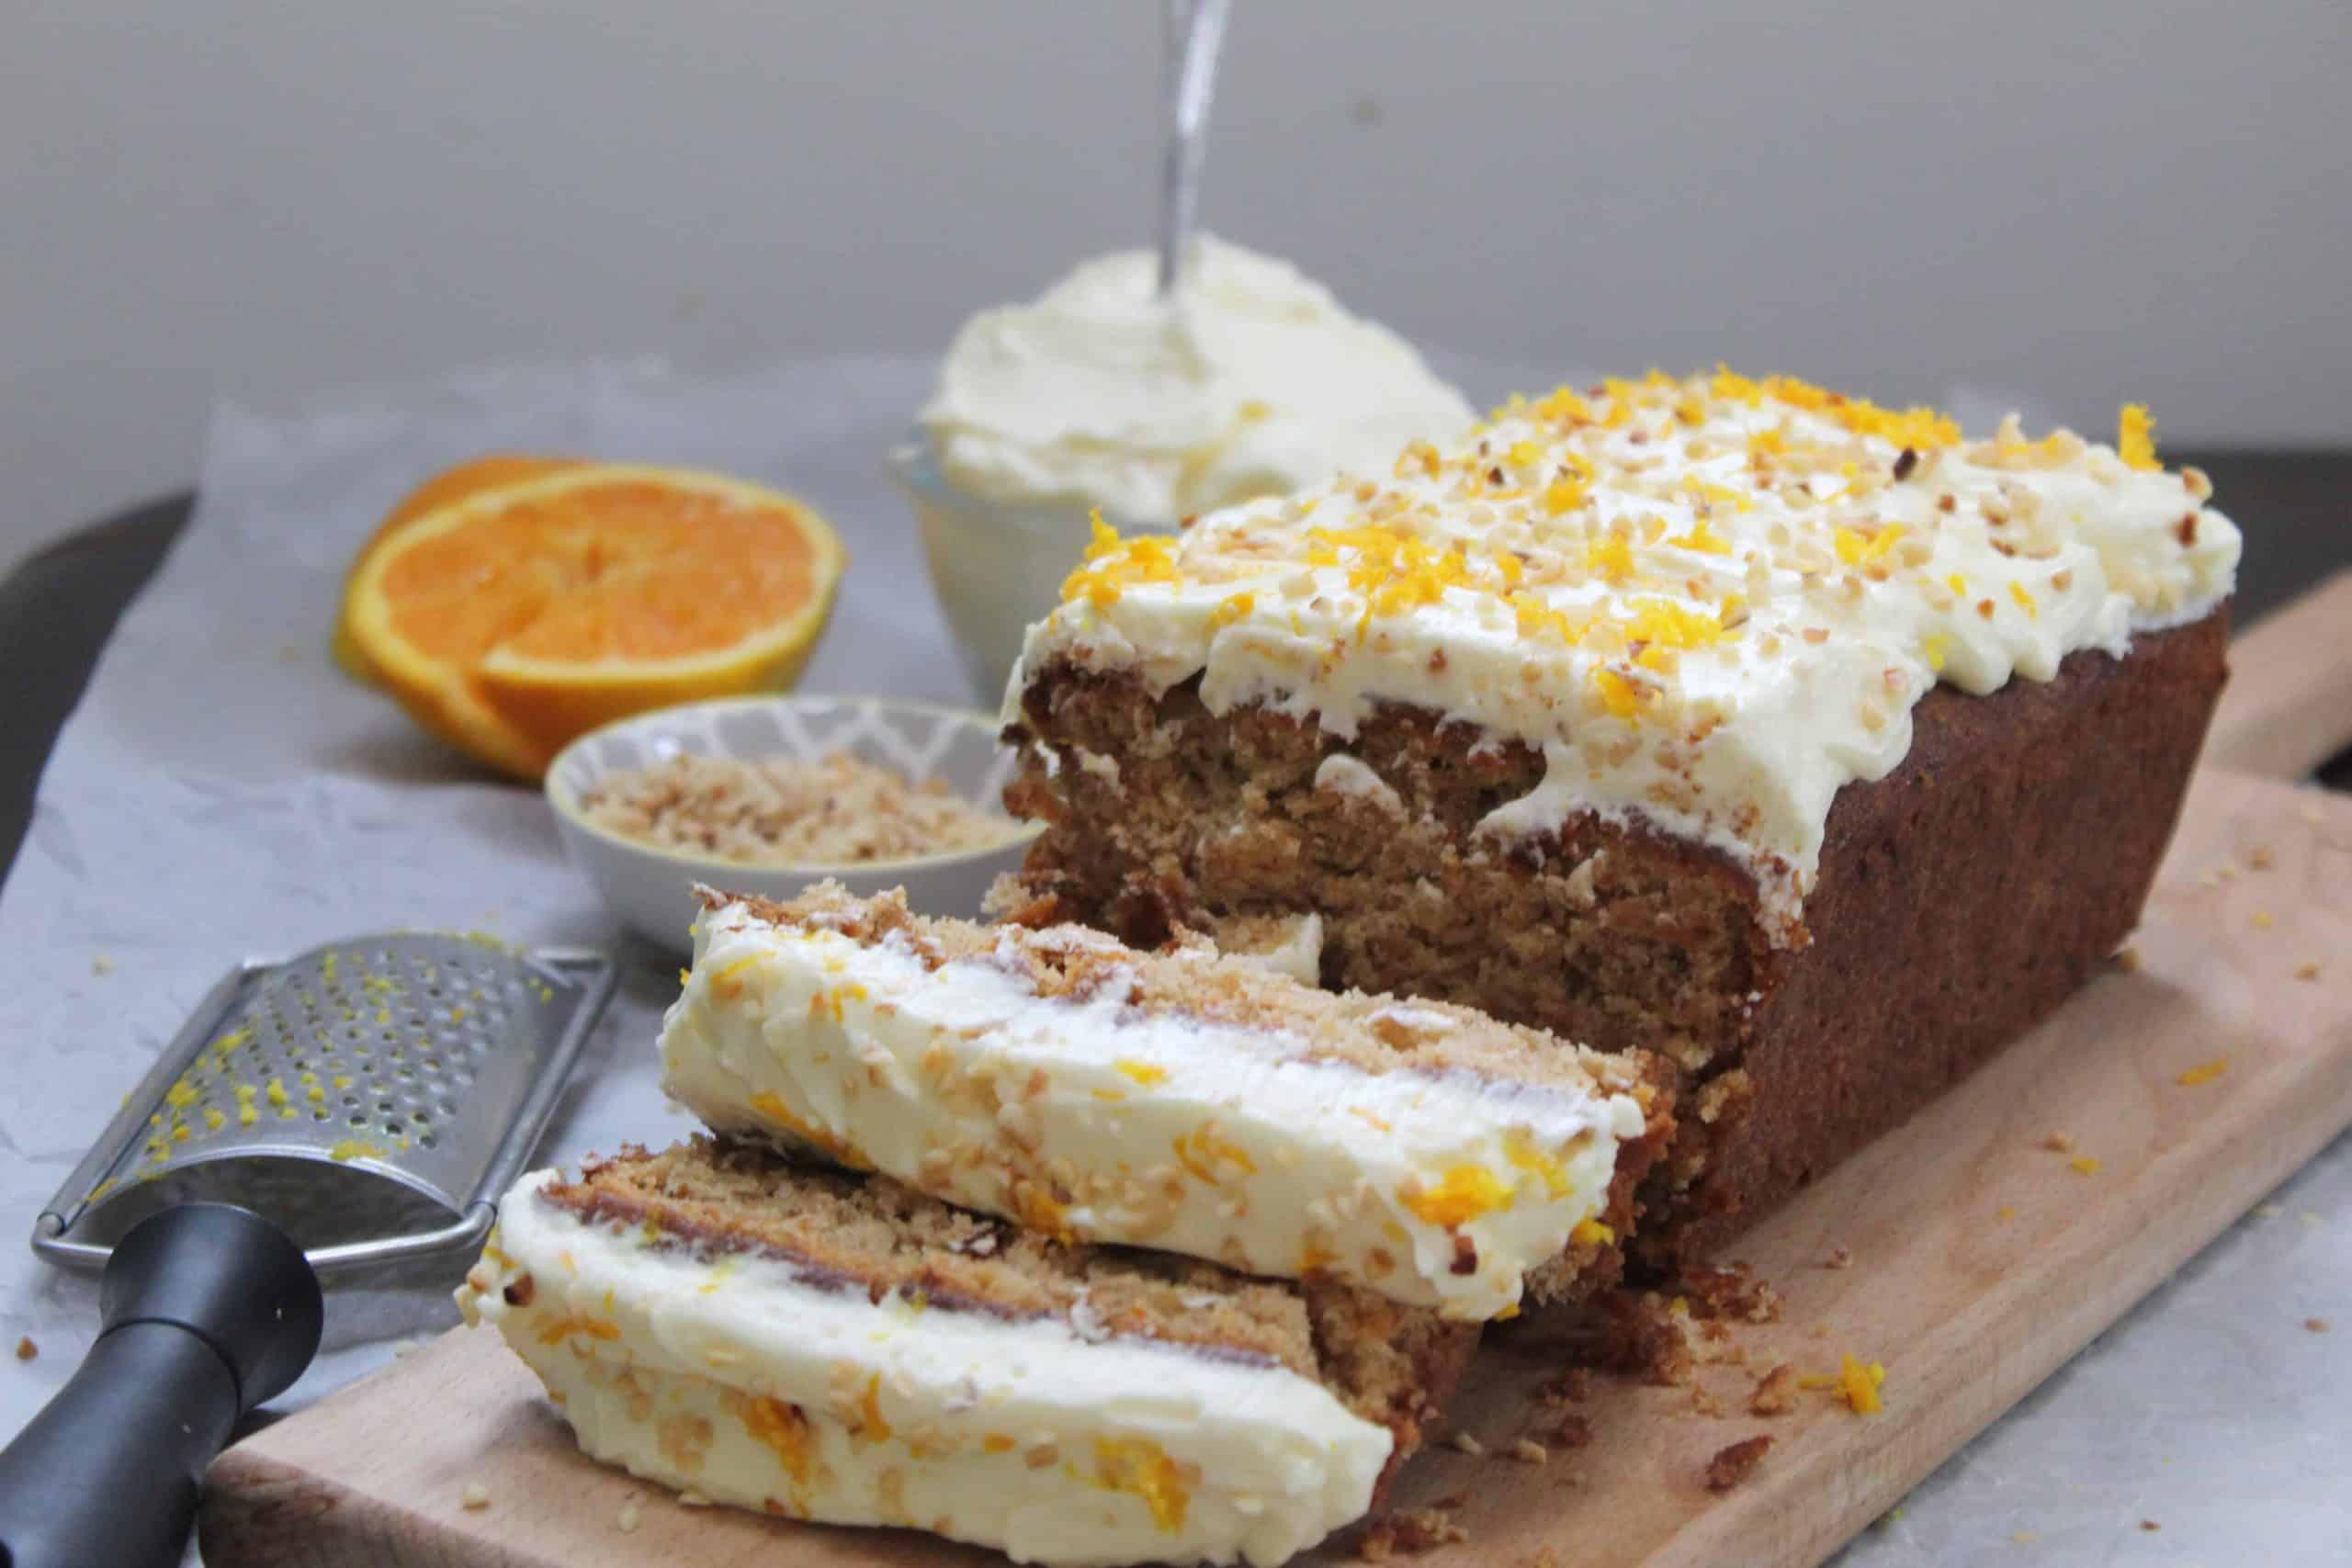 gluten free carrot cake recipe with hazelnut and orange